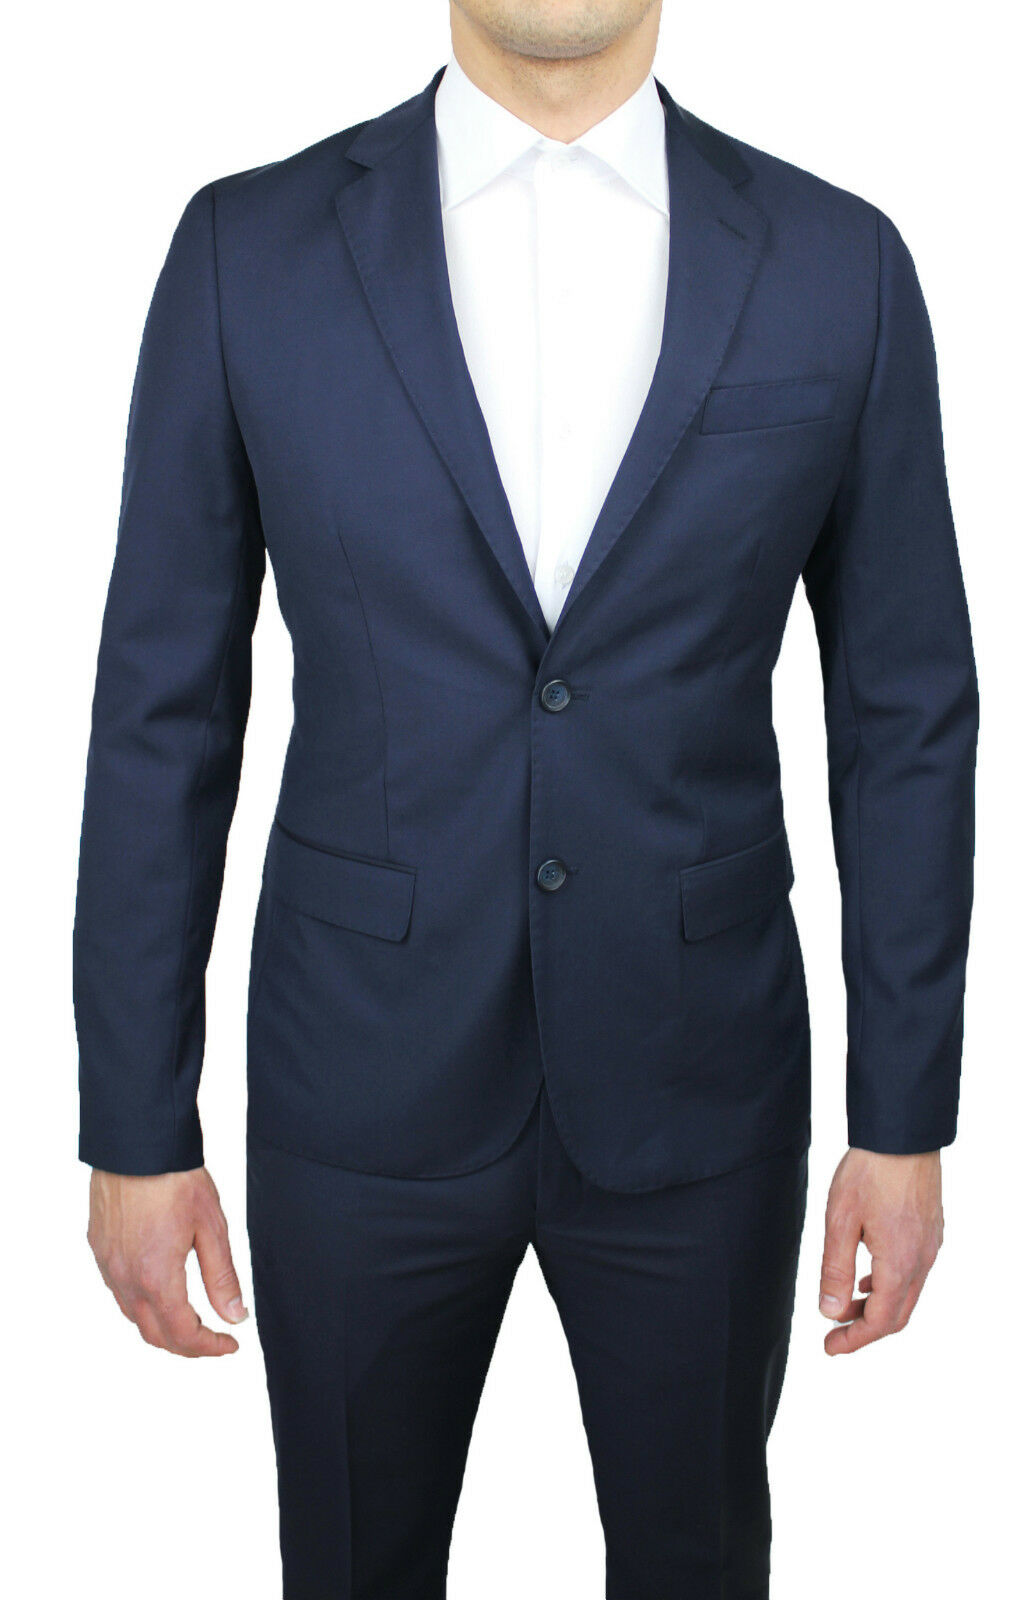 Kleidung Mann Diamant dunkelblau komplett Tag 42 44 46 48 50 52 54 56 58 60